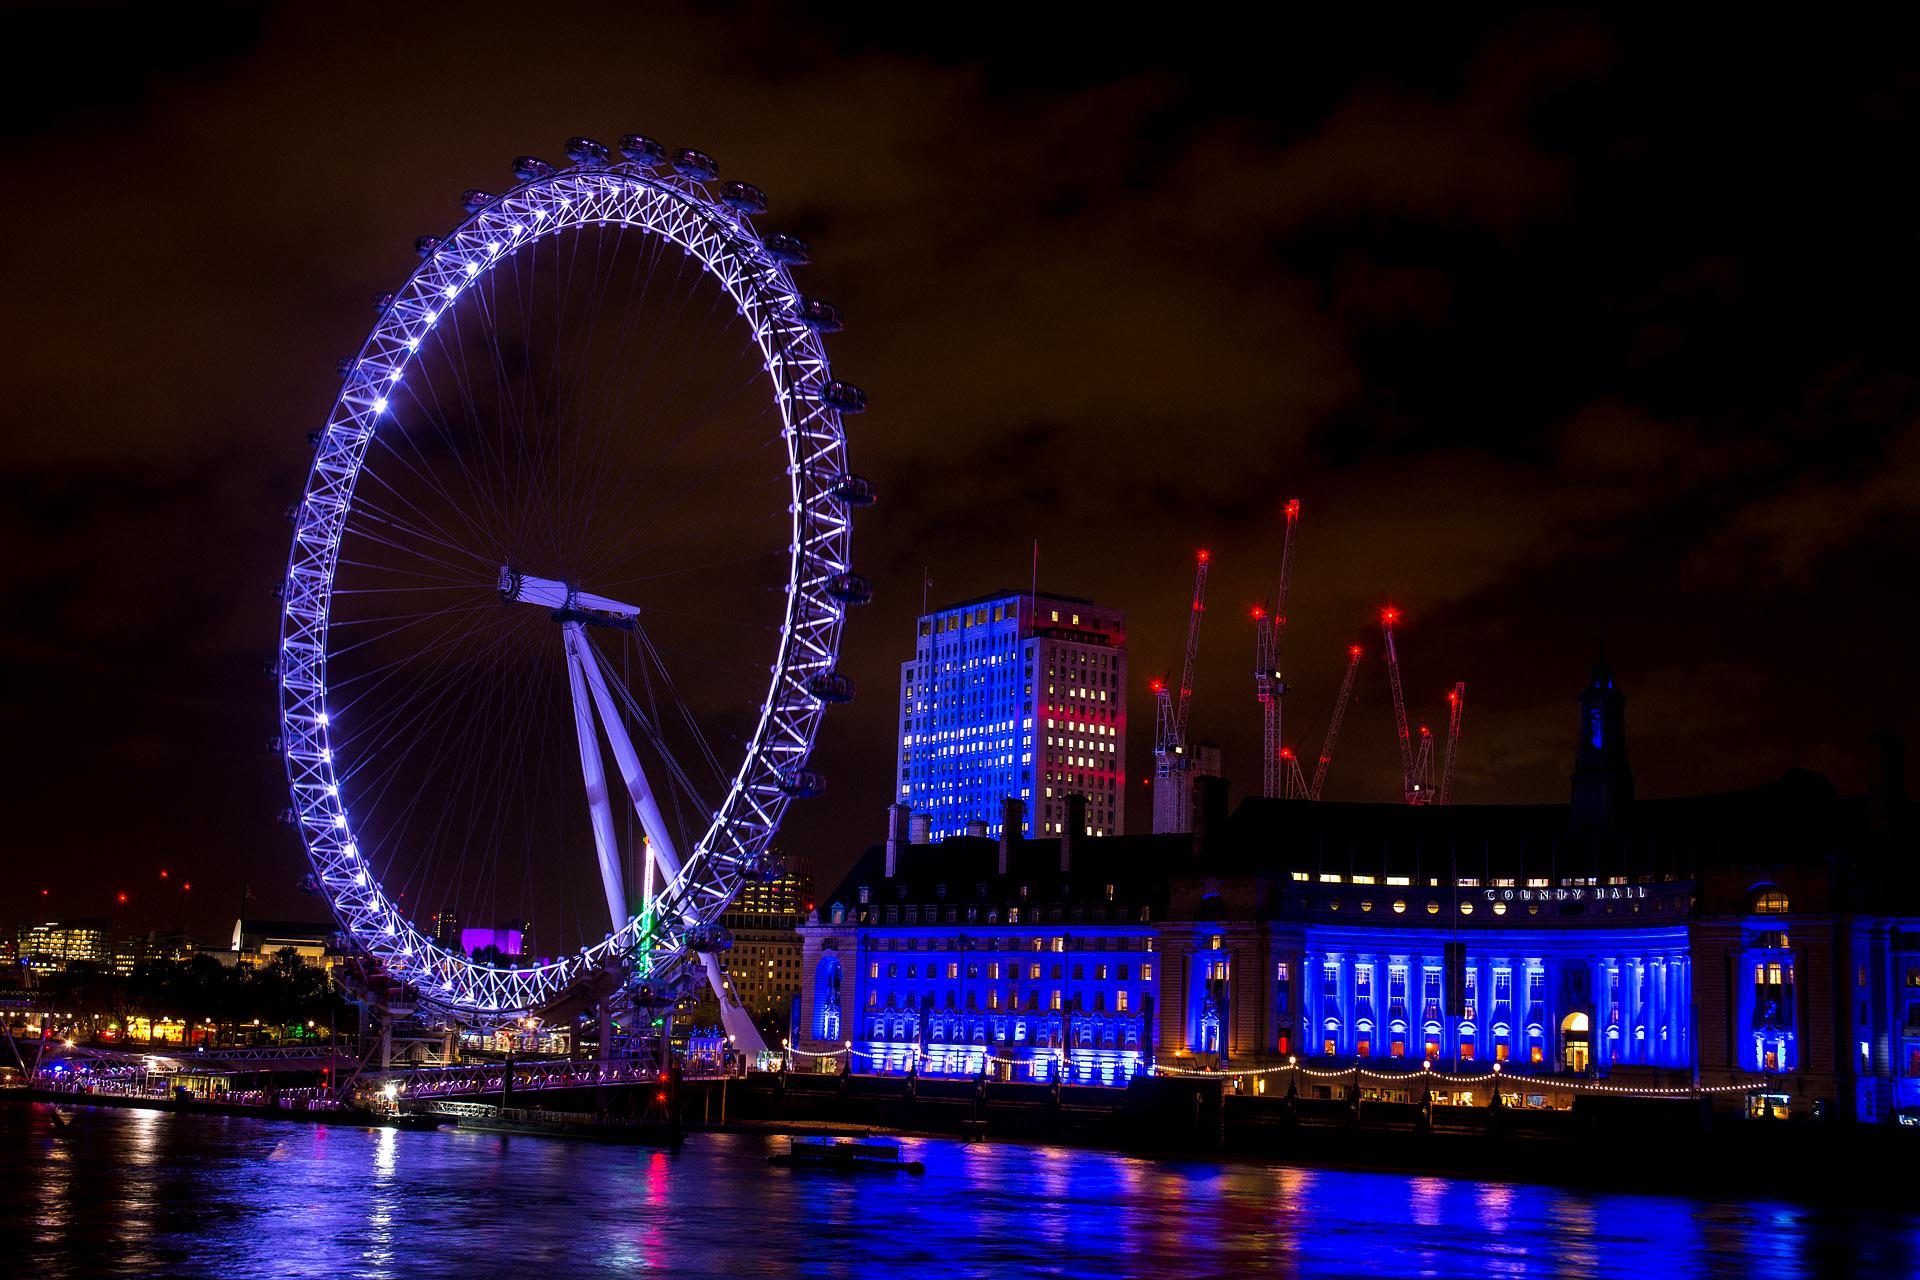 London Eye & The County Hall